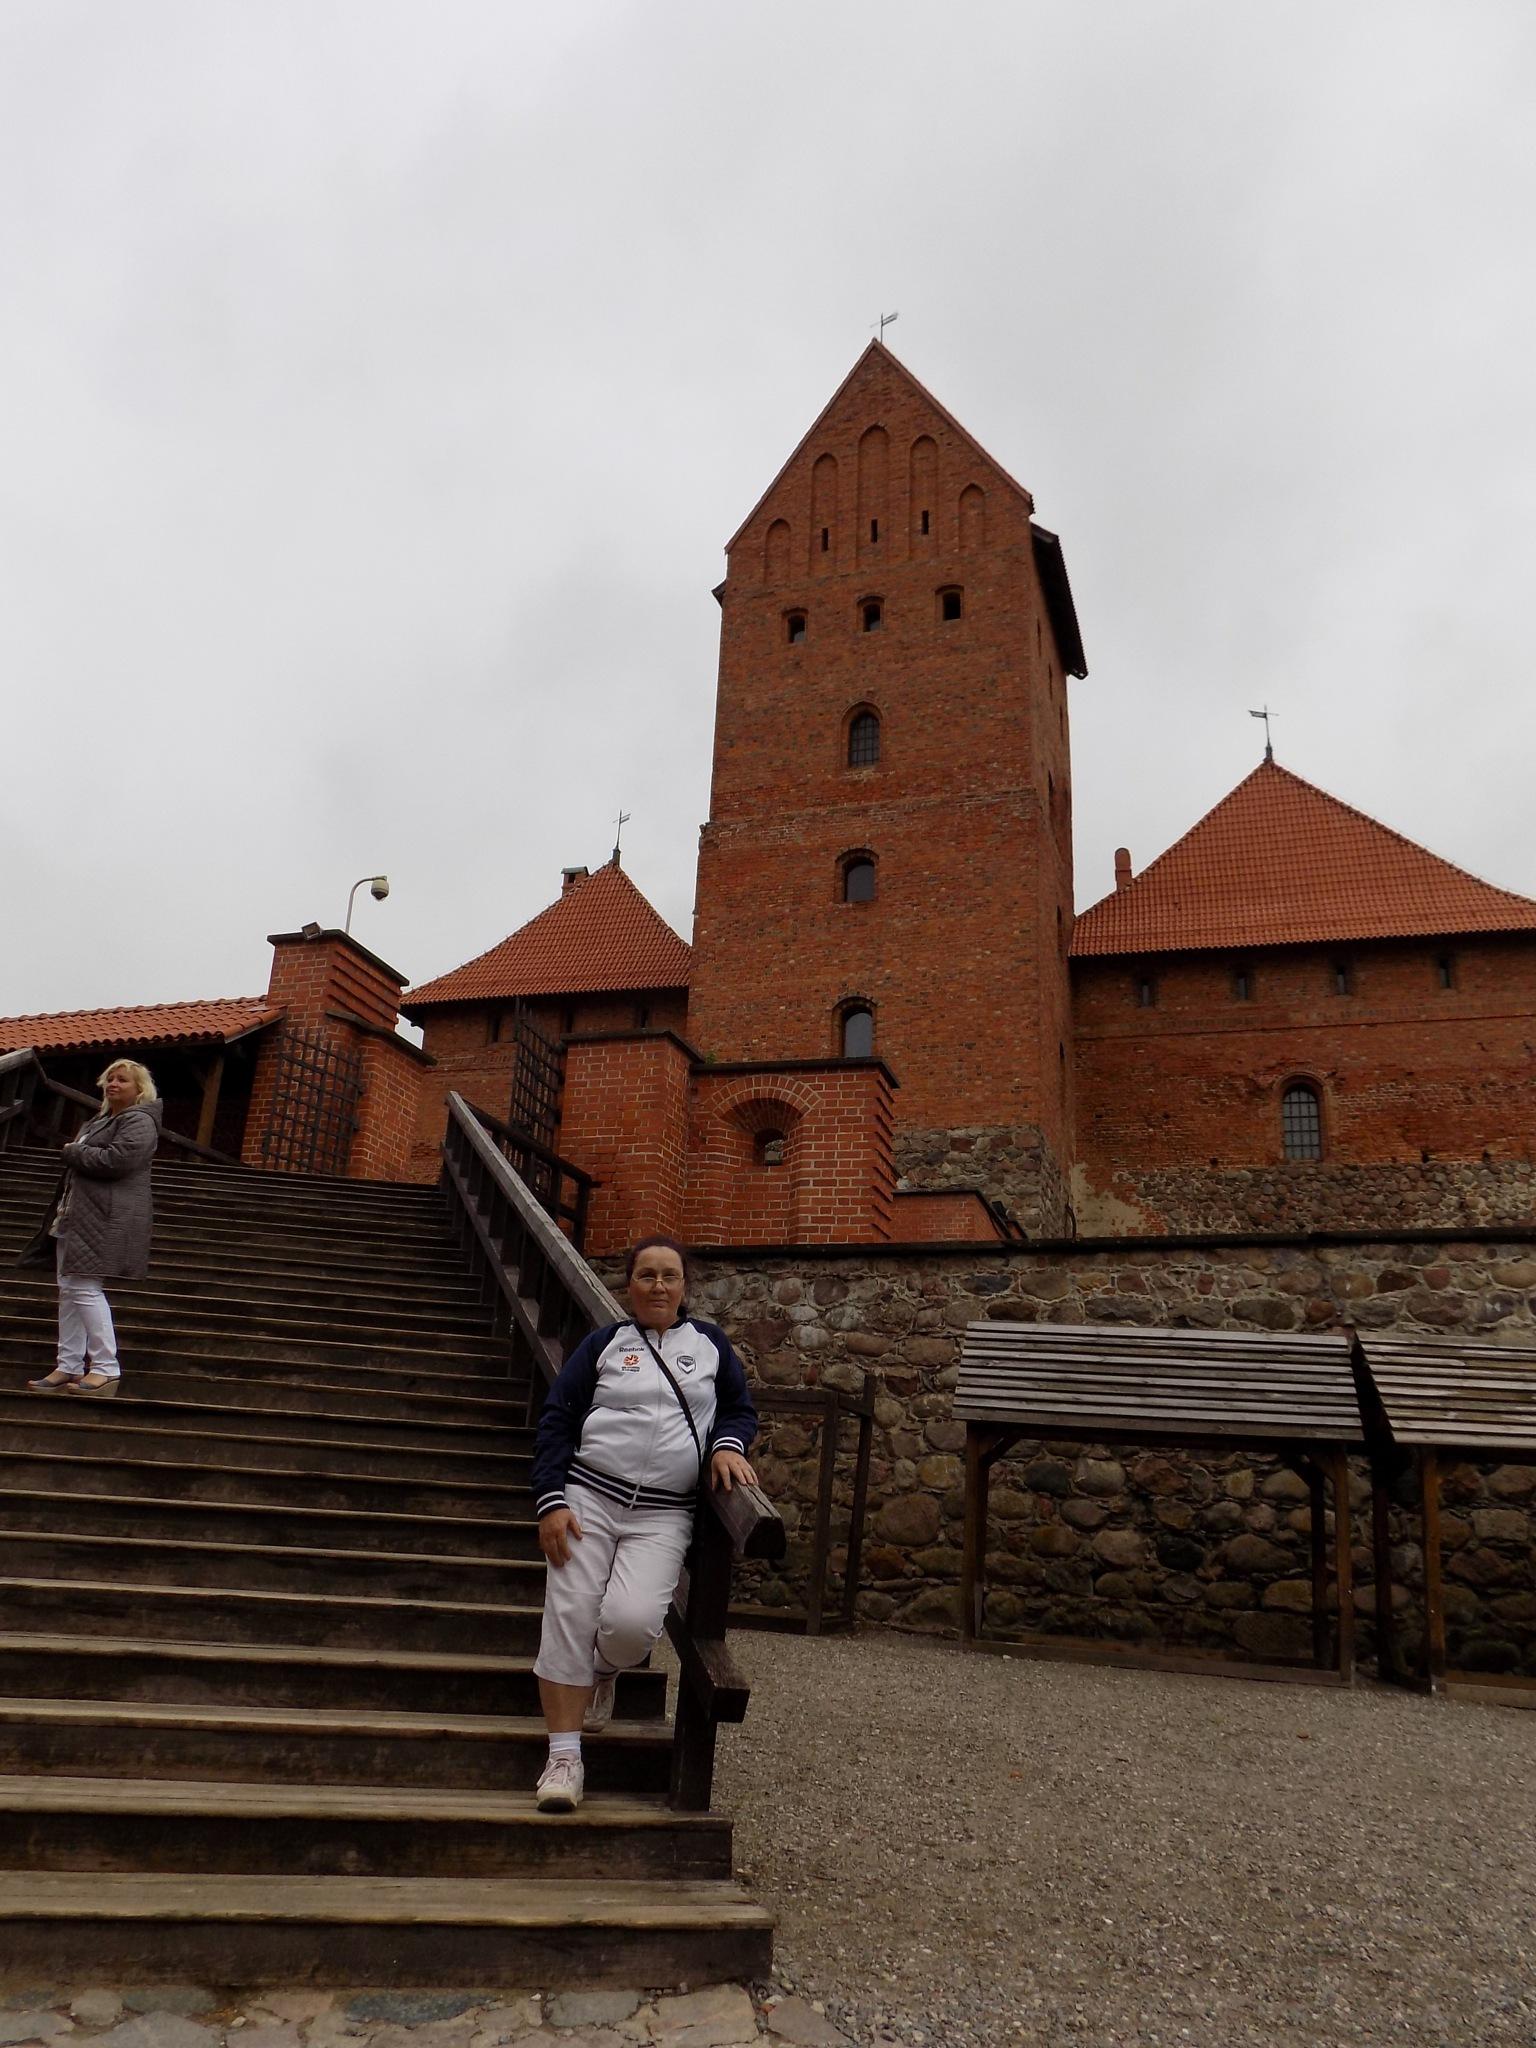 The castle. by uzkuraitiene62